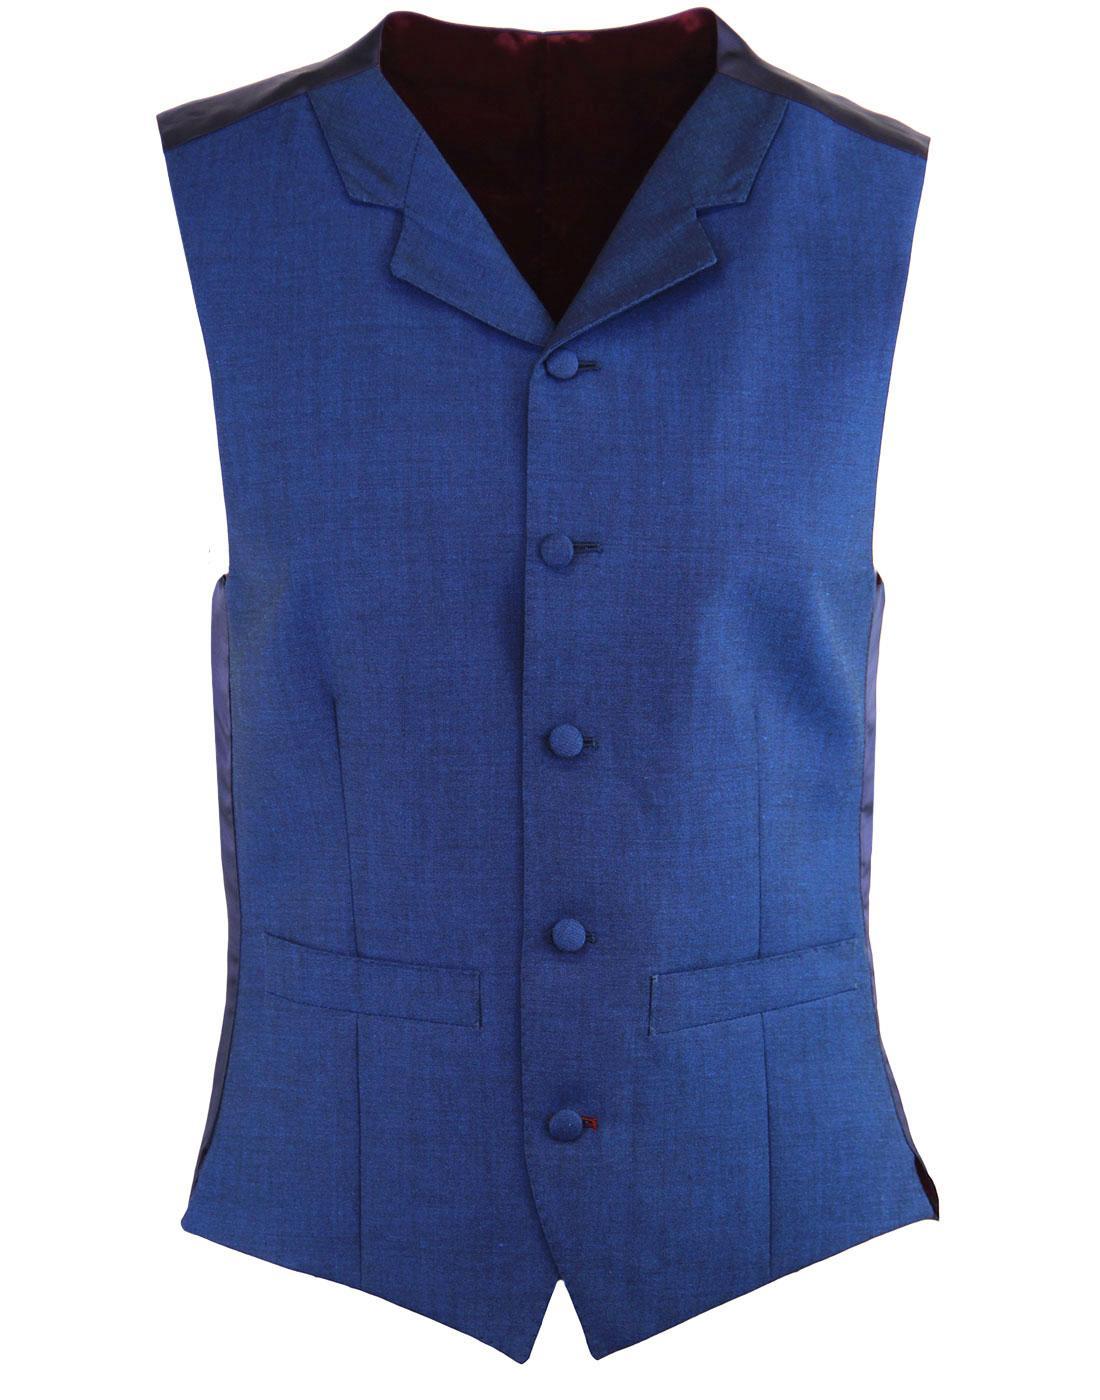 MADCAP ENGLAND 60s Mod Mohair Tonic Waistcoat BLUE